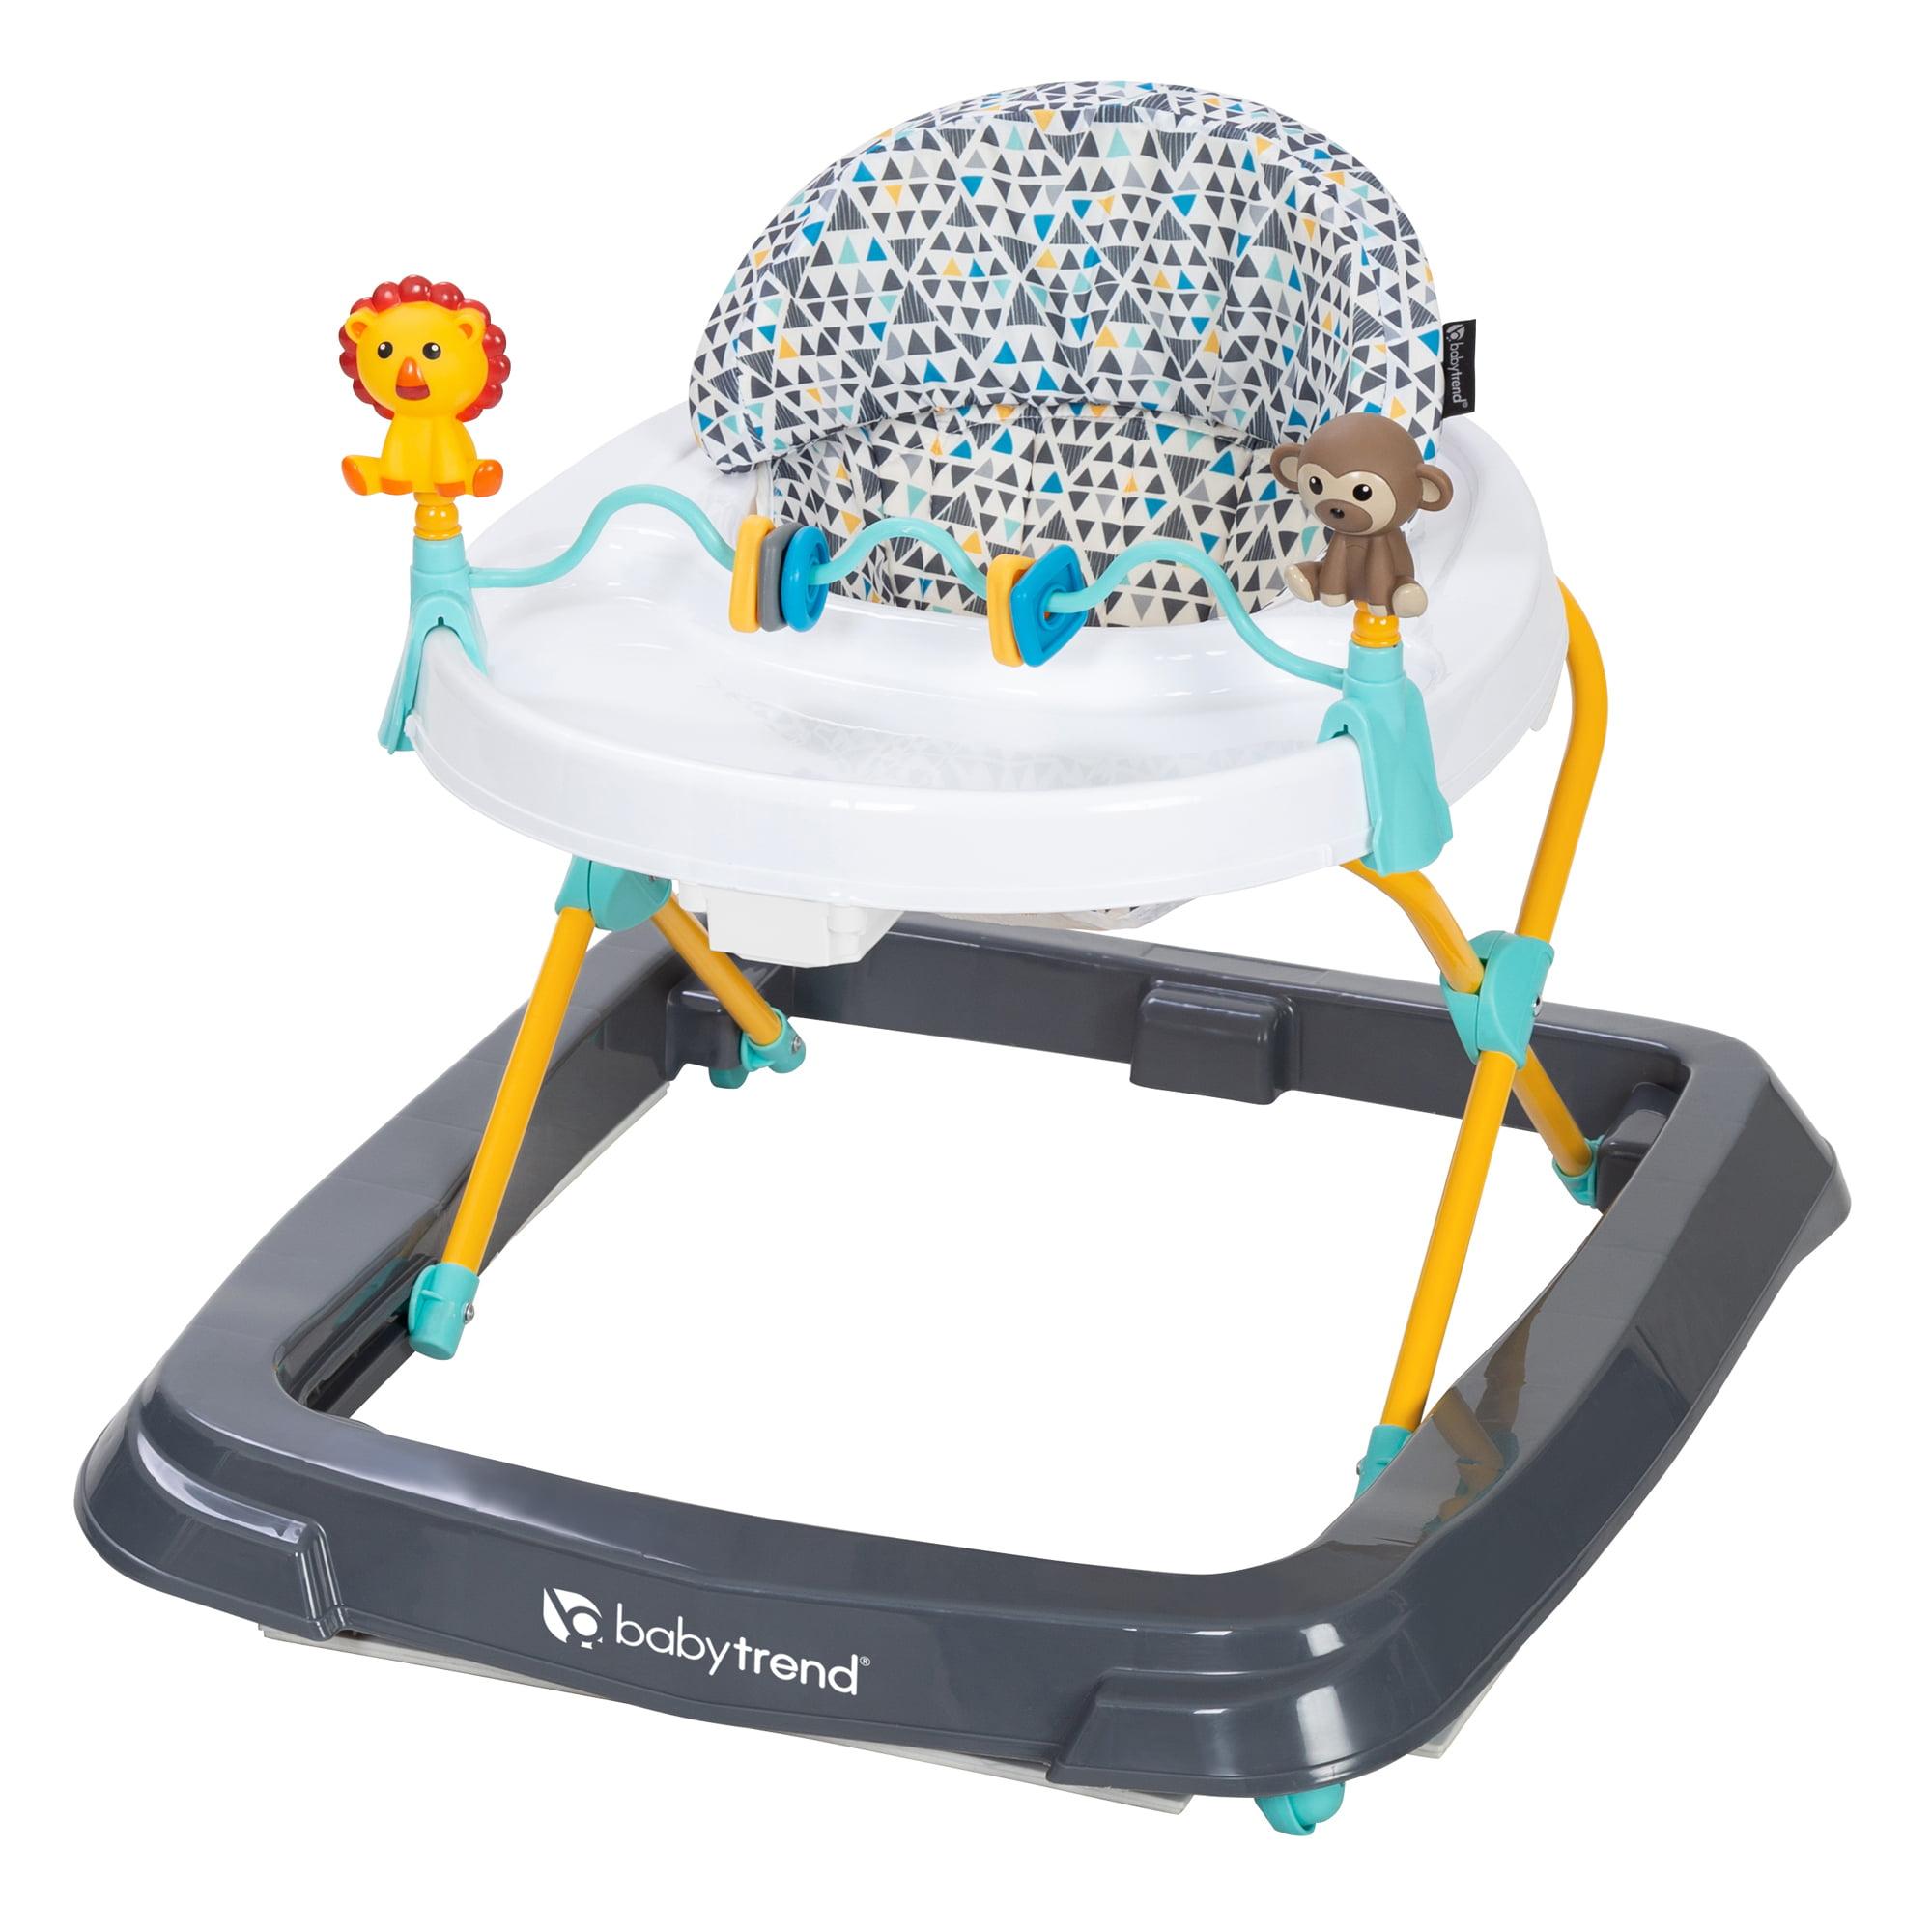 Baby Trend Trend Walker- Zoo-ometry by Baby Trend